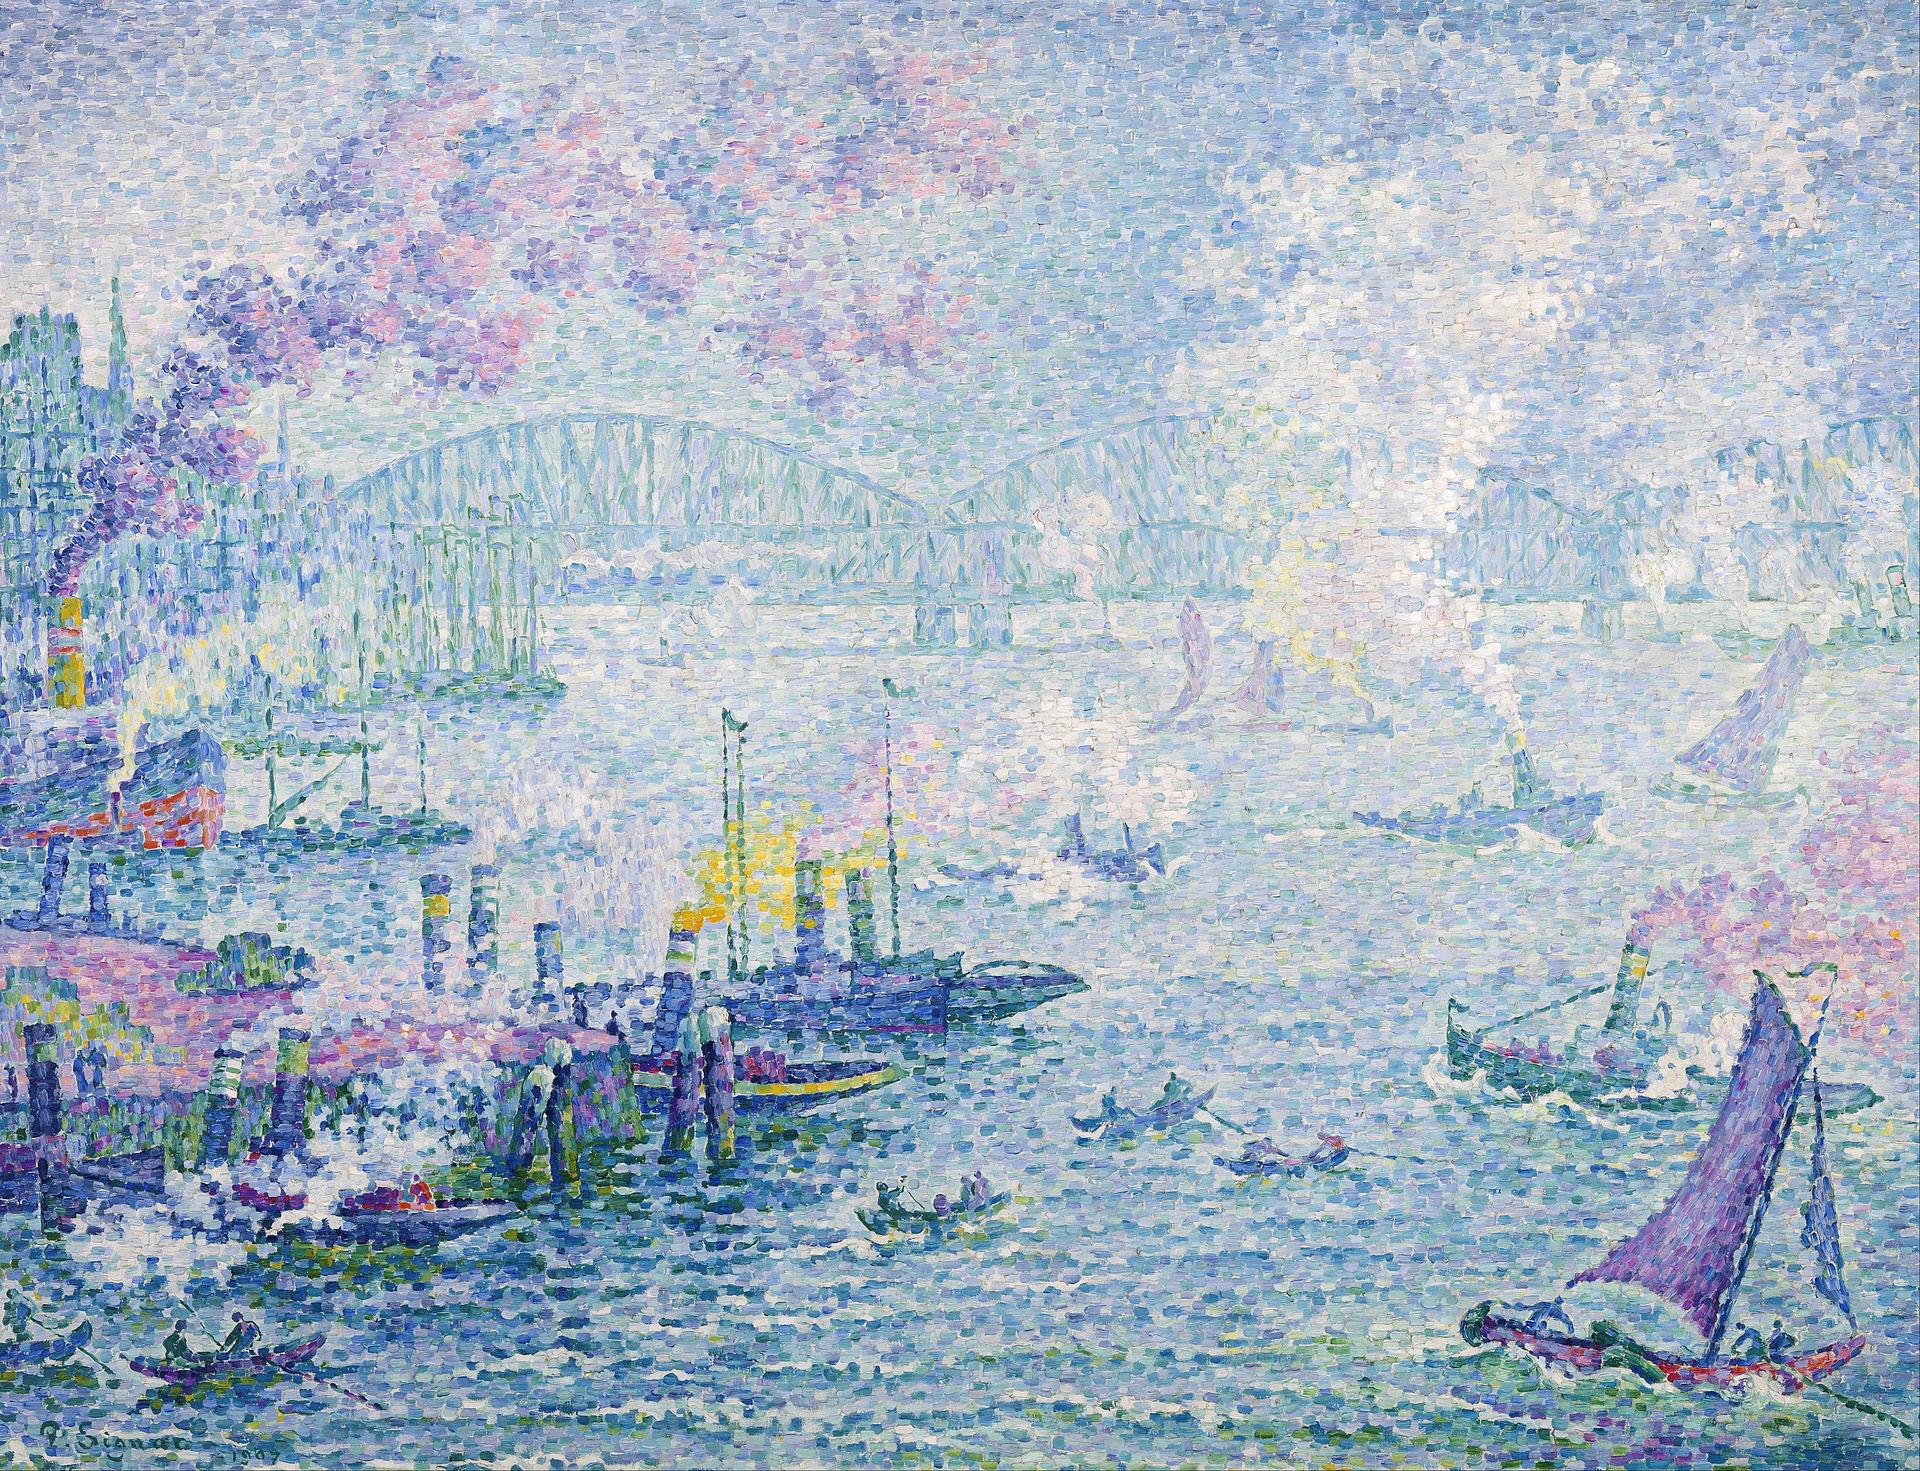 Paul Signac,  The Port of Rotterdam , 1907, Museum Boijmans Van Beuningen.